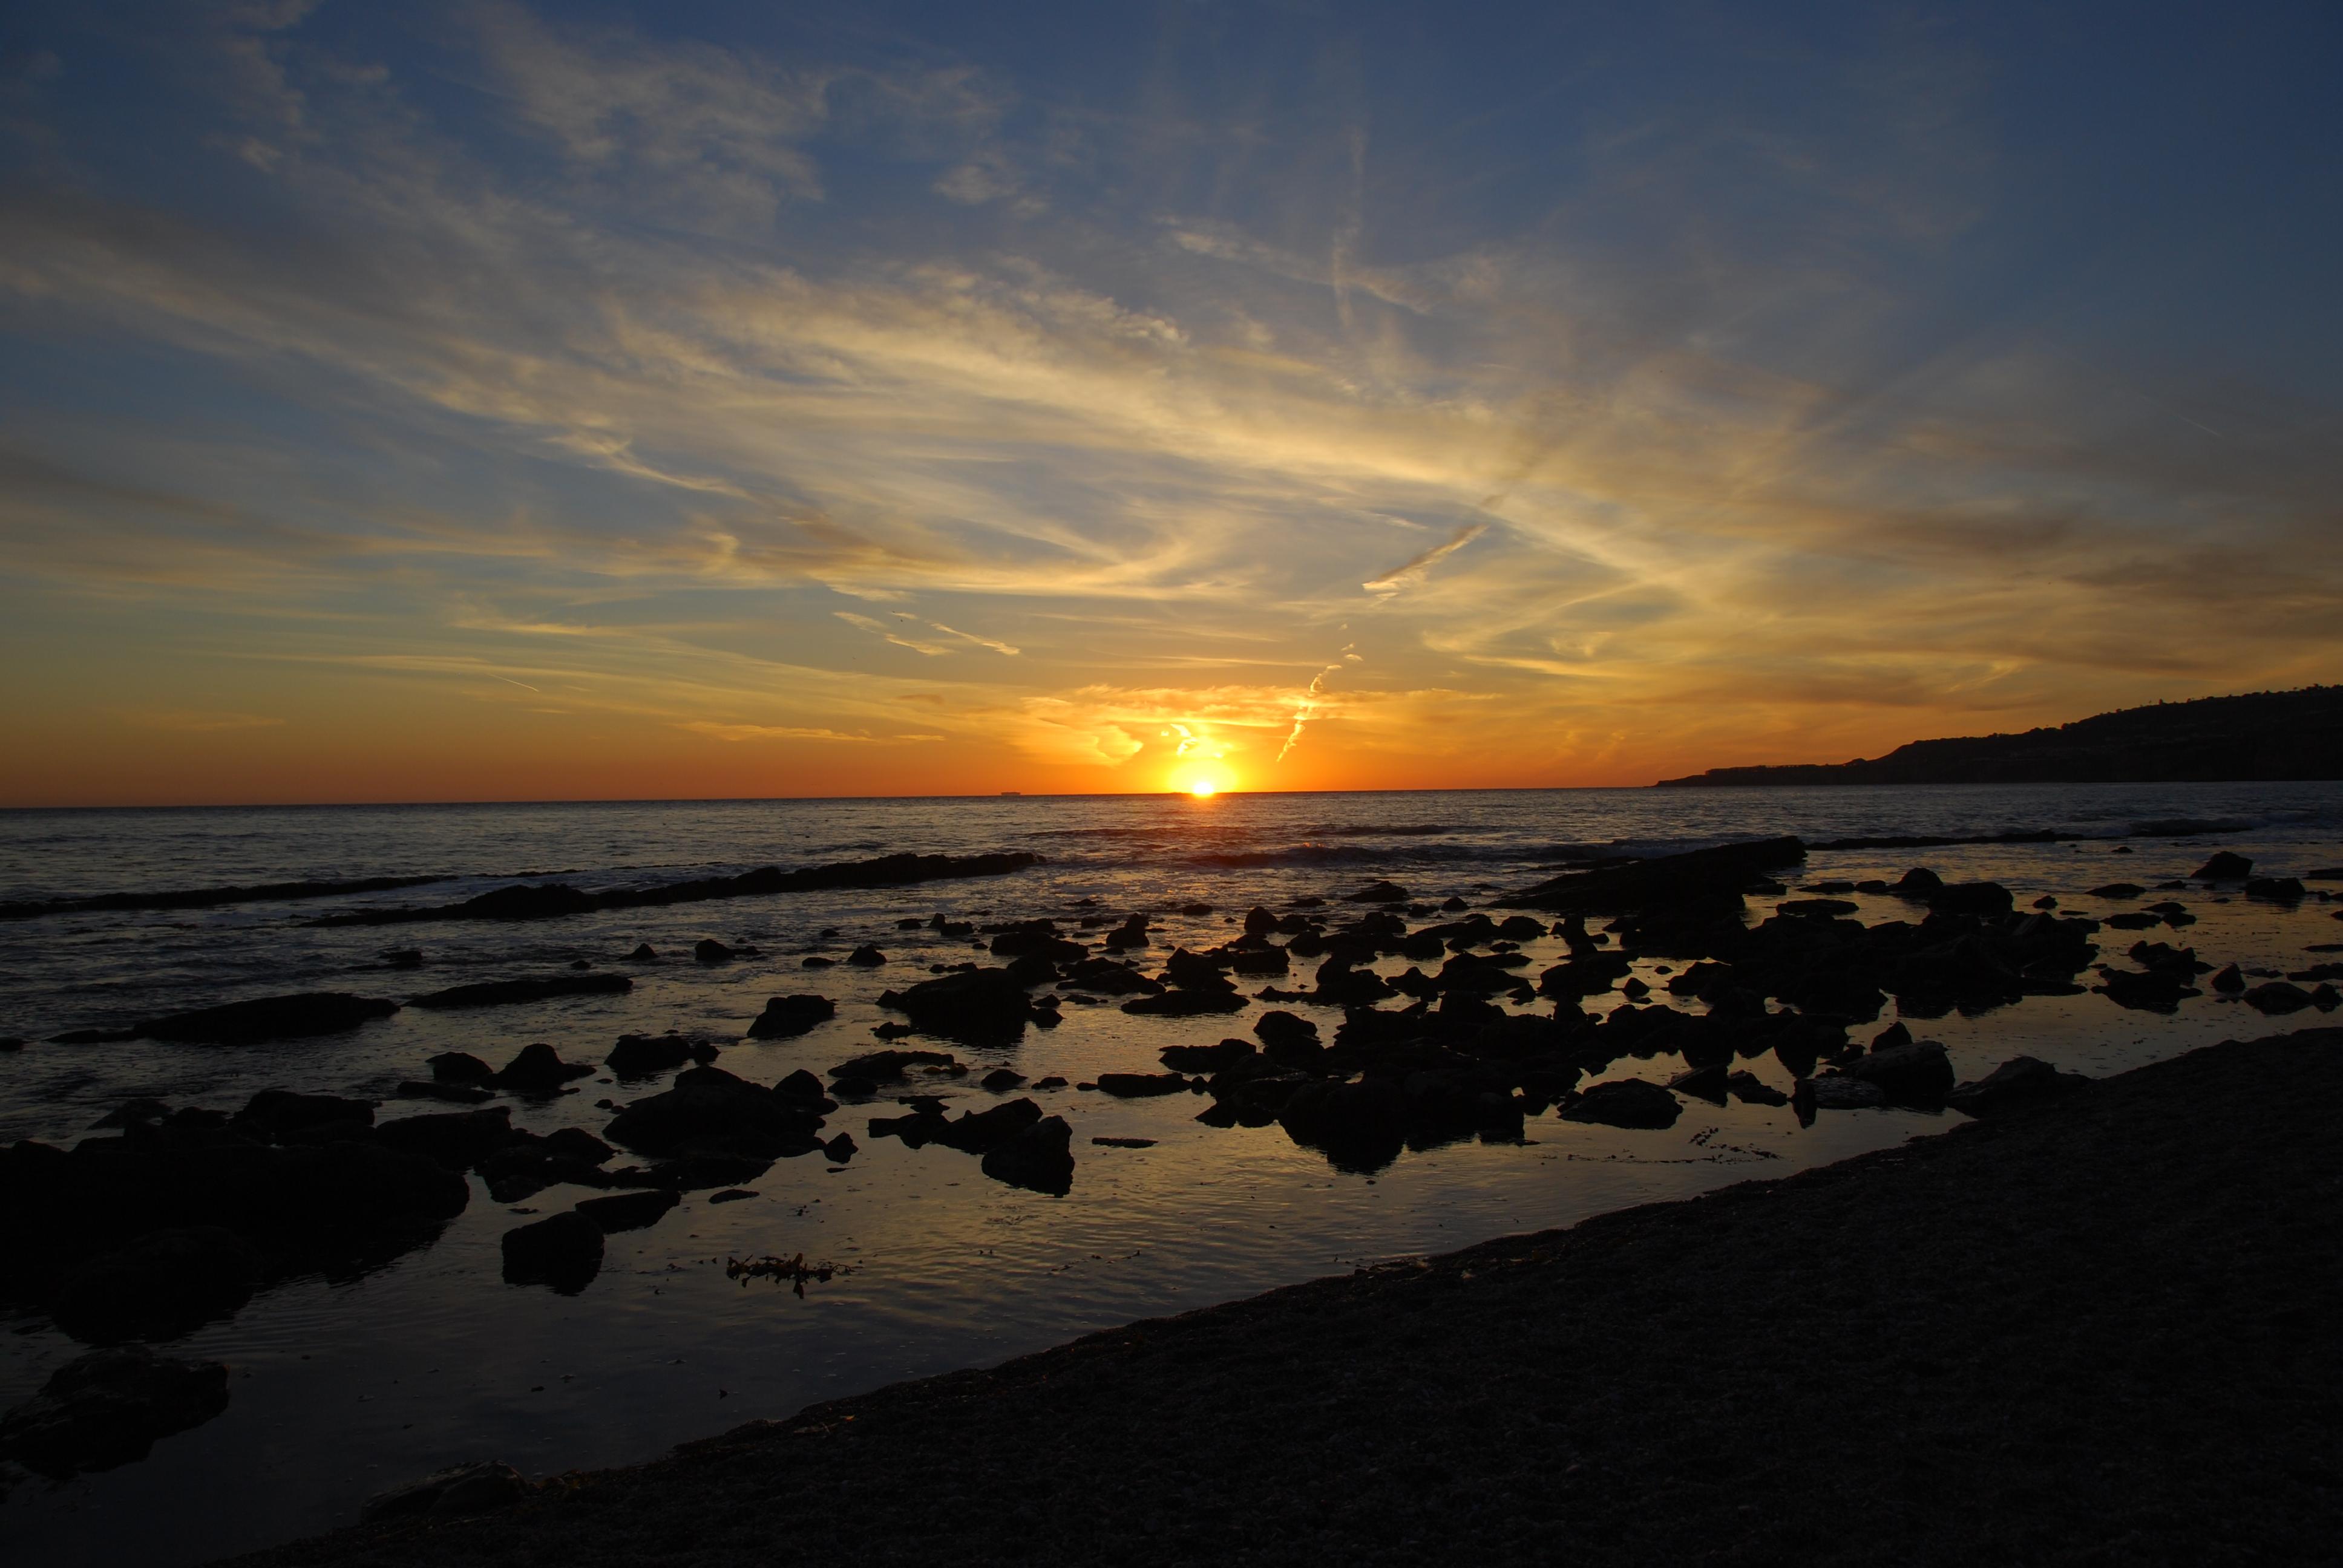 2008_Mar9_OceanTrail_Babe_Sunny_Sunset 300